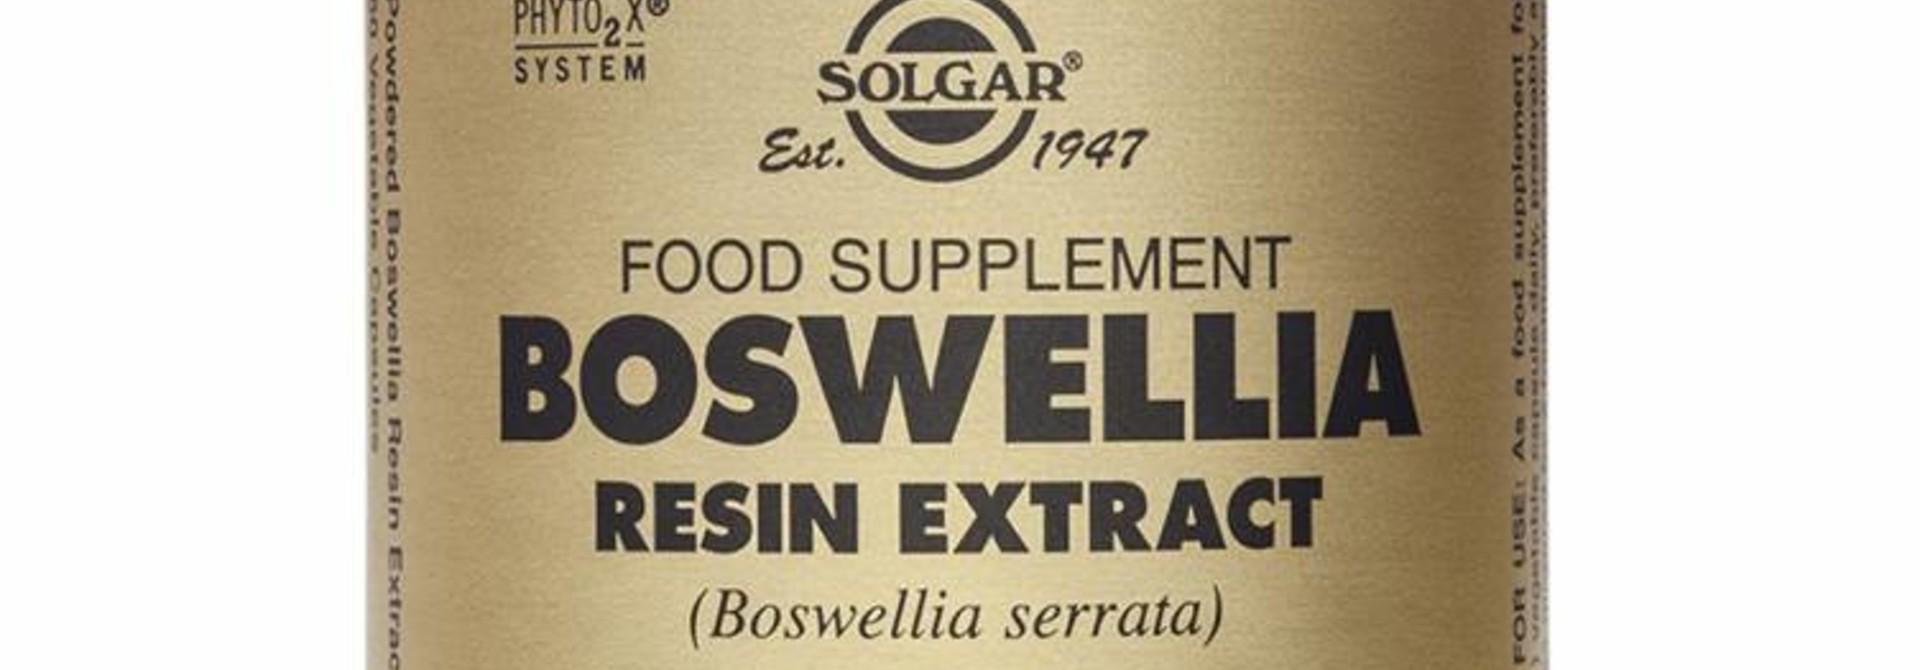 Boswellia Resin Extract 60 plantaardige capsules